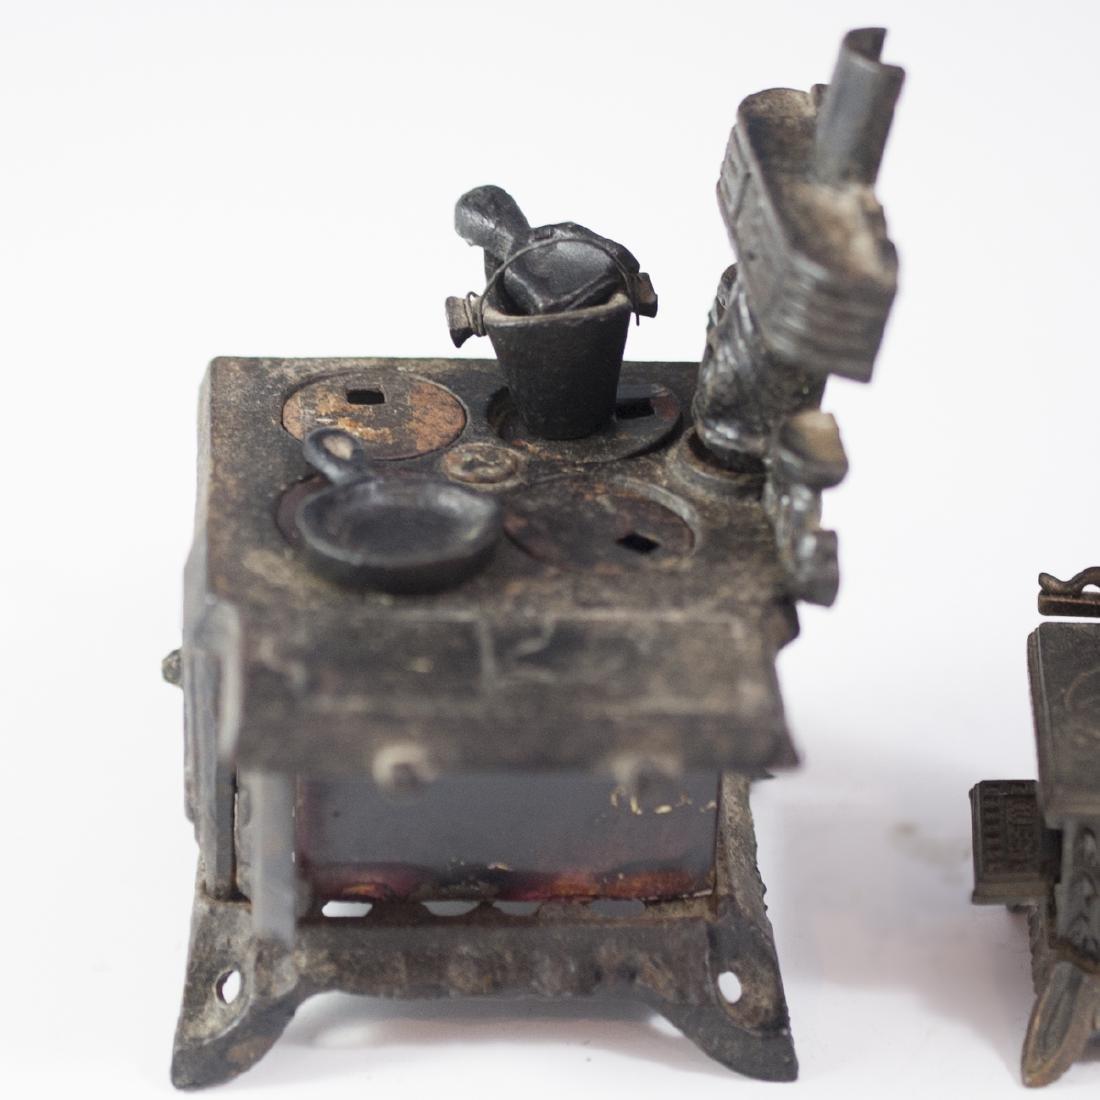 Queen Cast Iron Miniature Salesman Stoves - 3